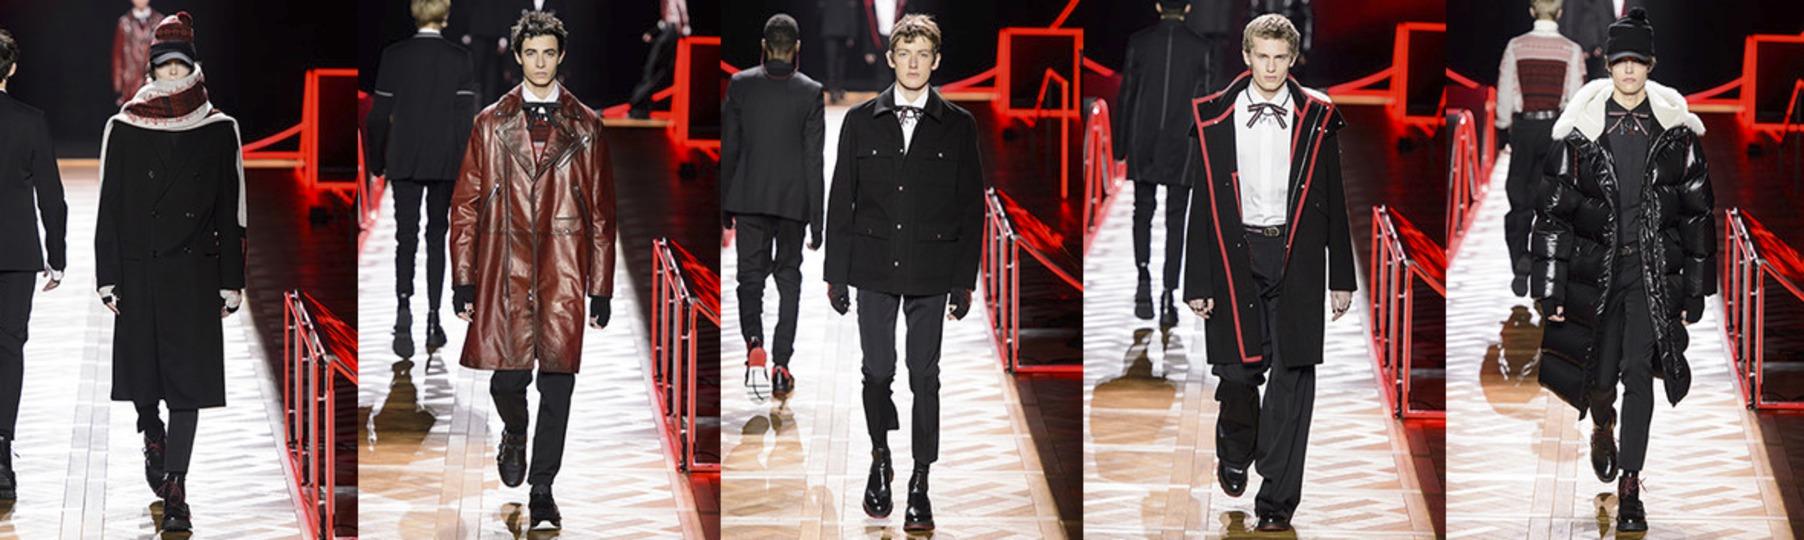 Dior Homme (Image 3)